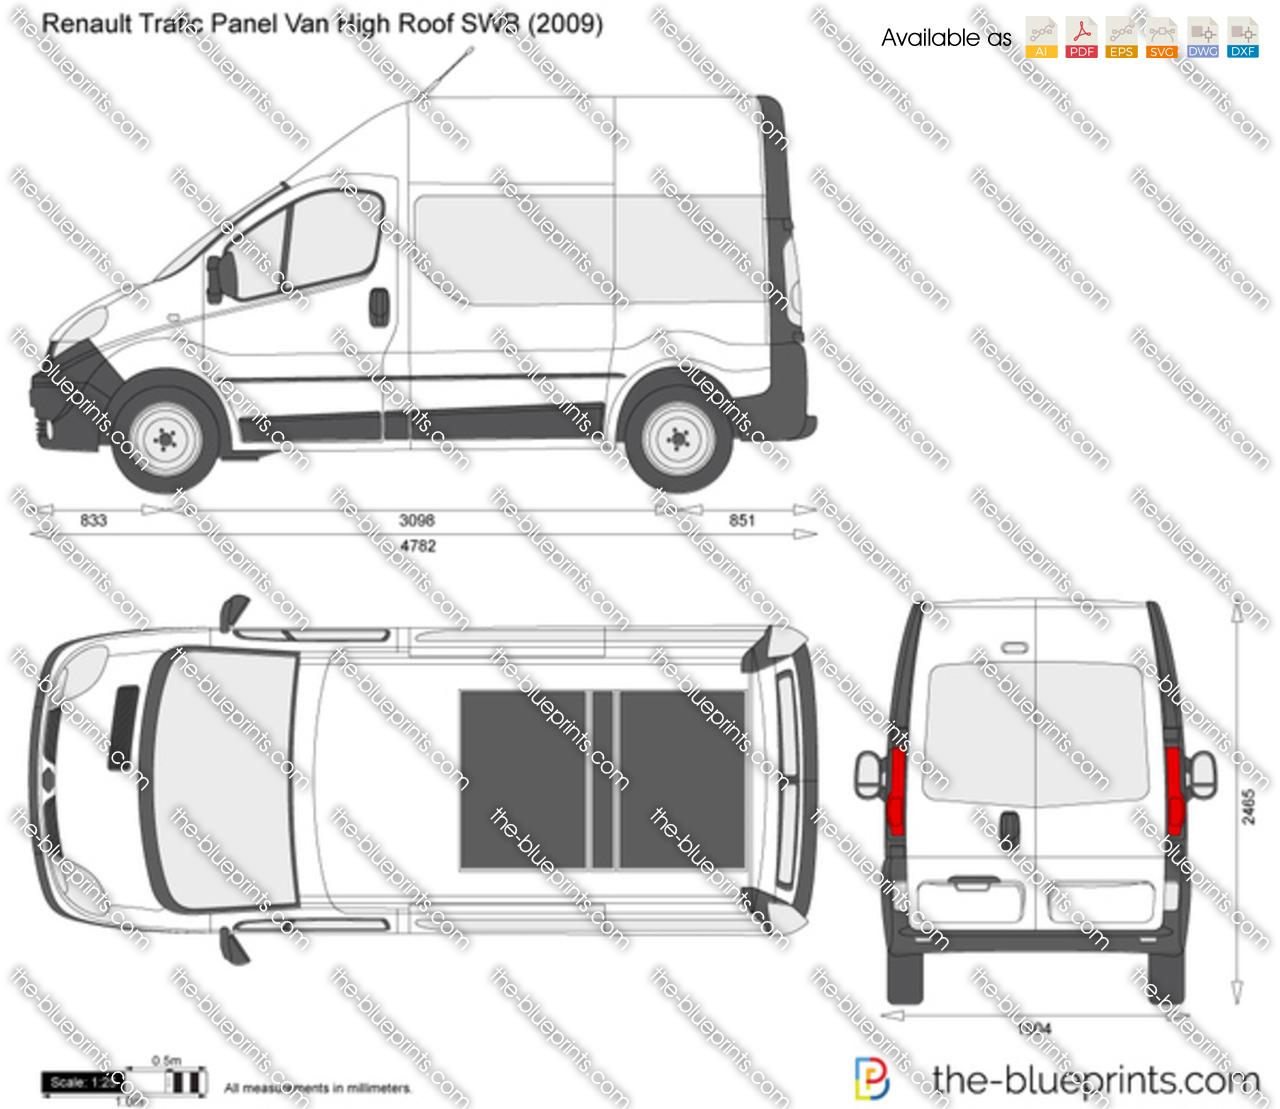 Renault Trafic Van Gvw: Renault Trafic Panel Van High Roof SWB Vector Drawing